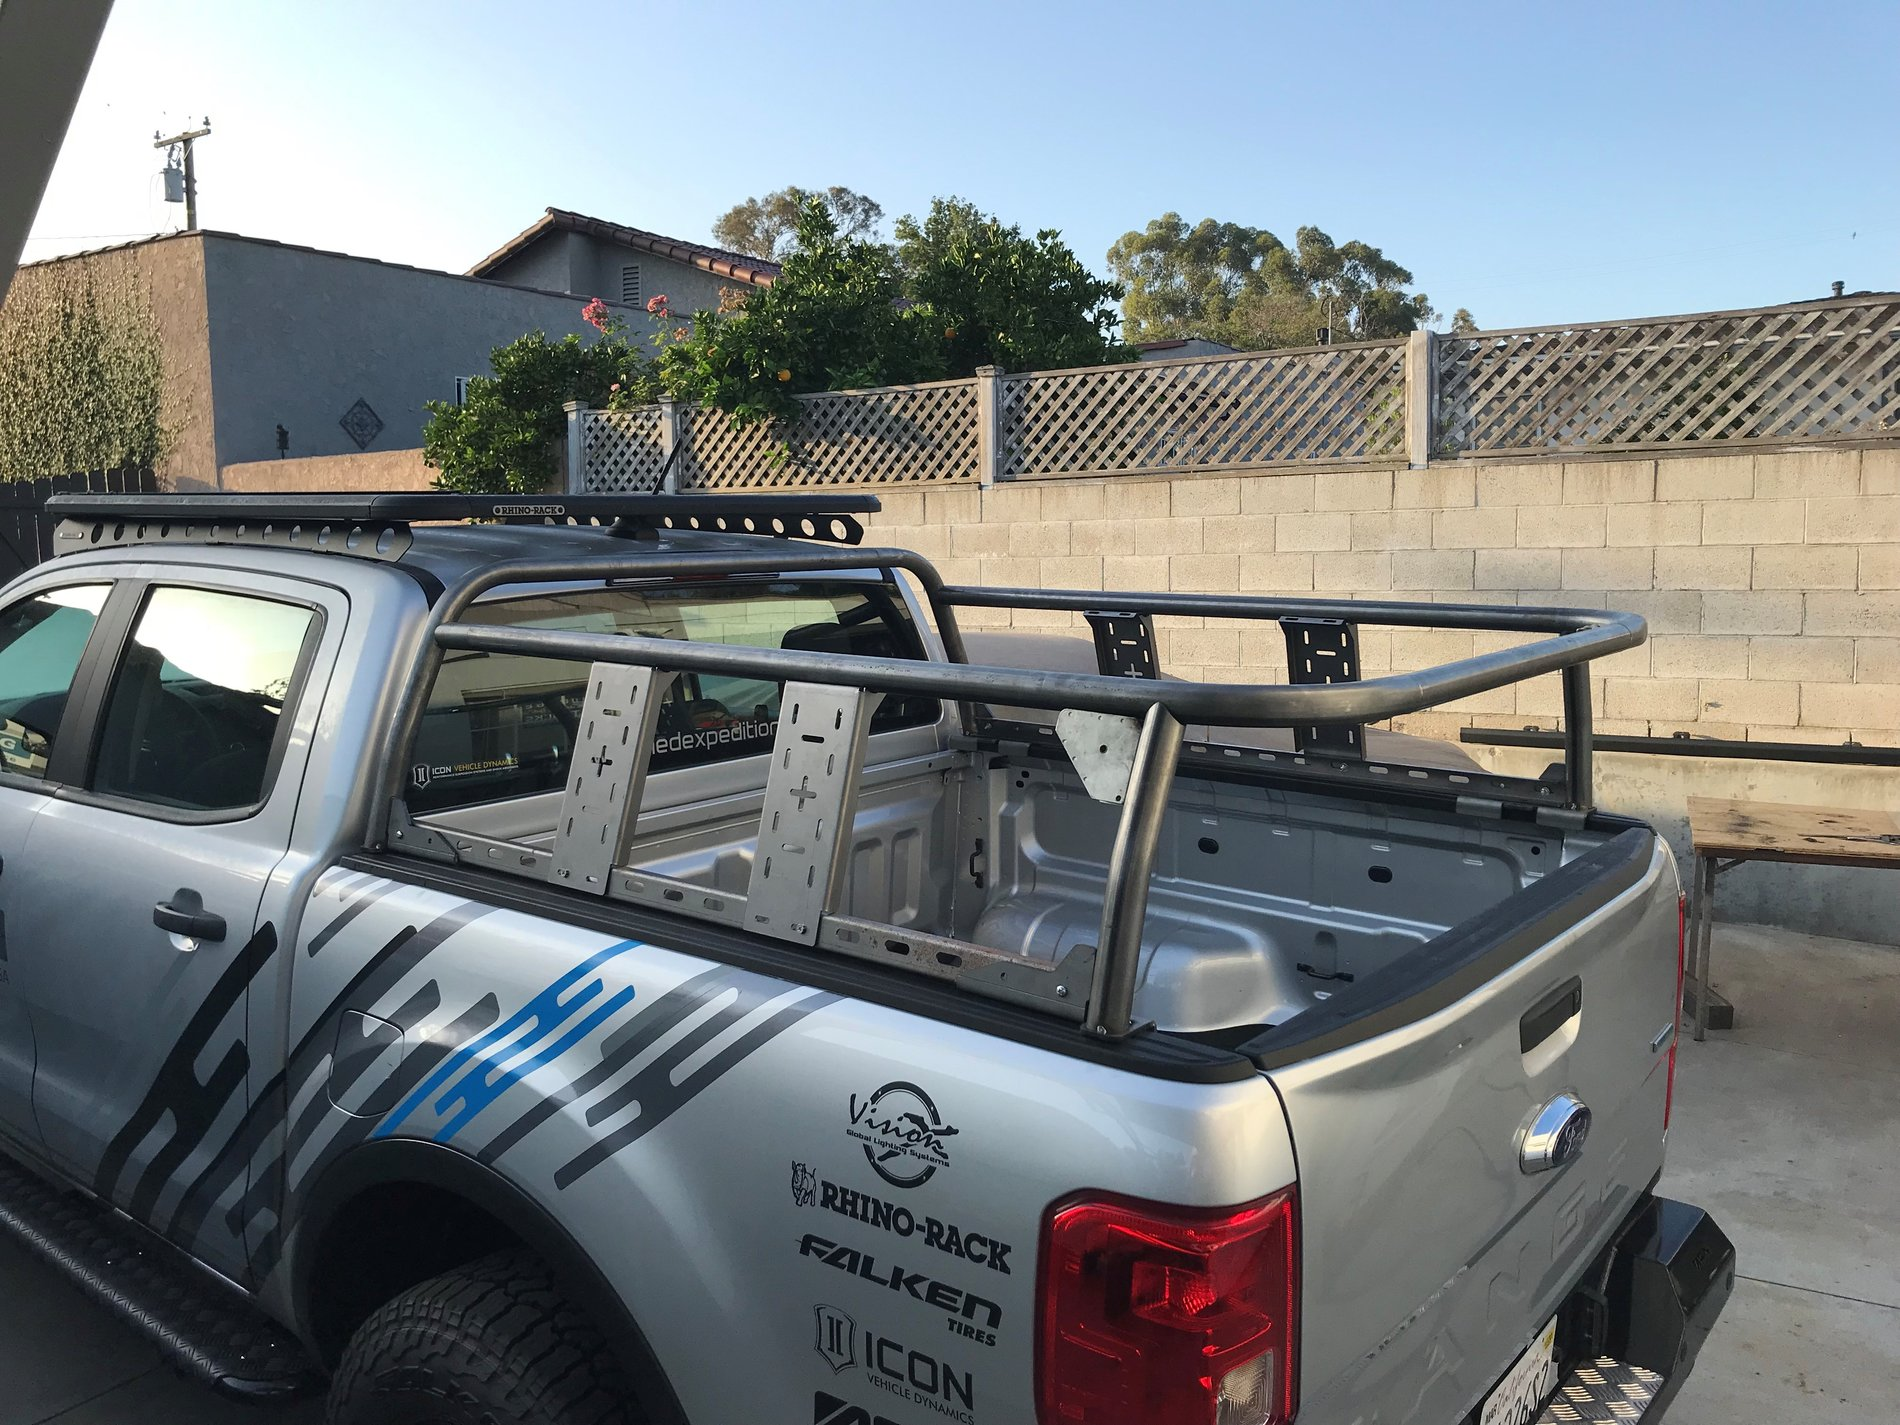 prototype bed rack for roof top tent